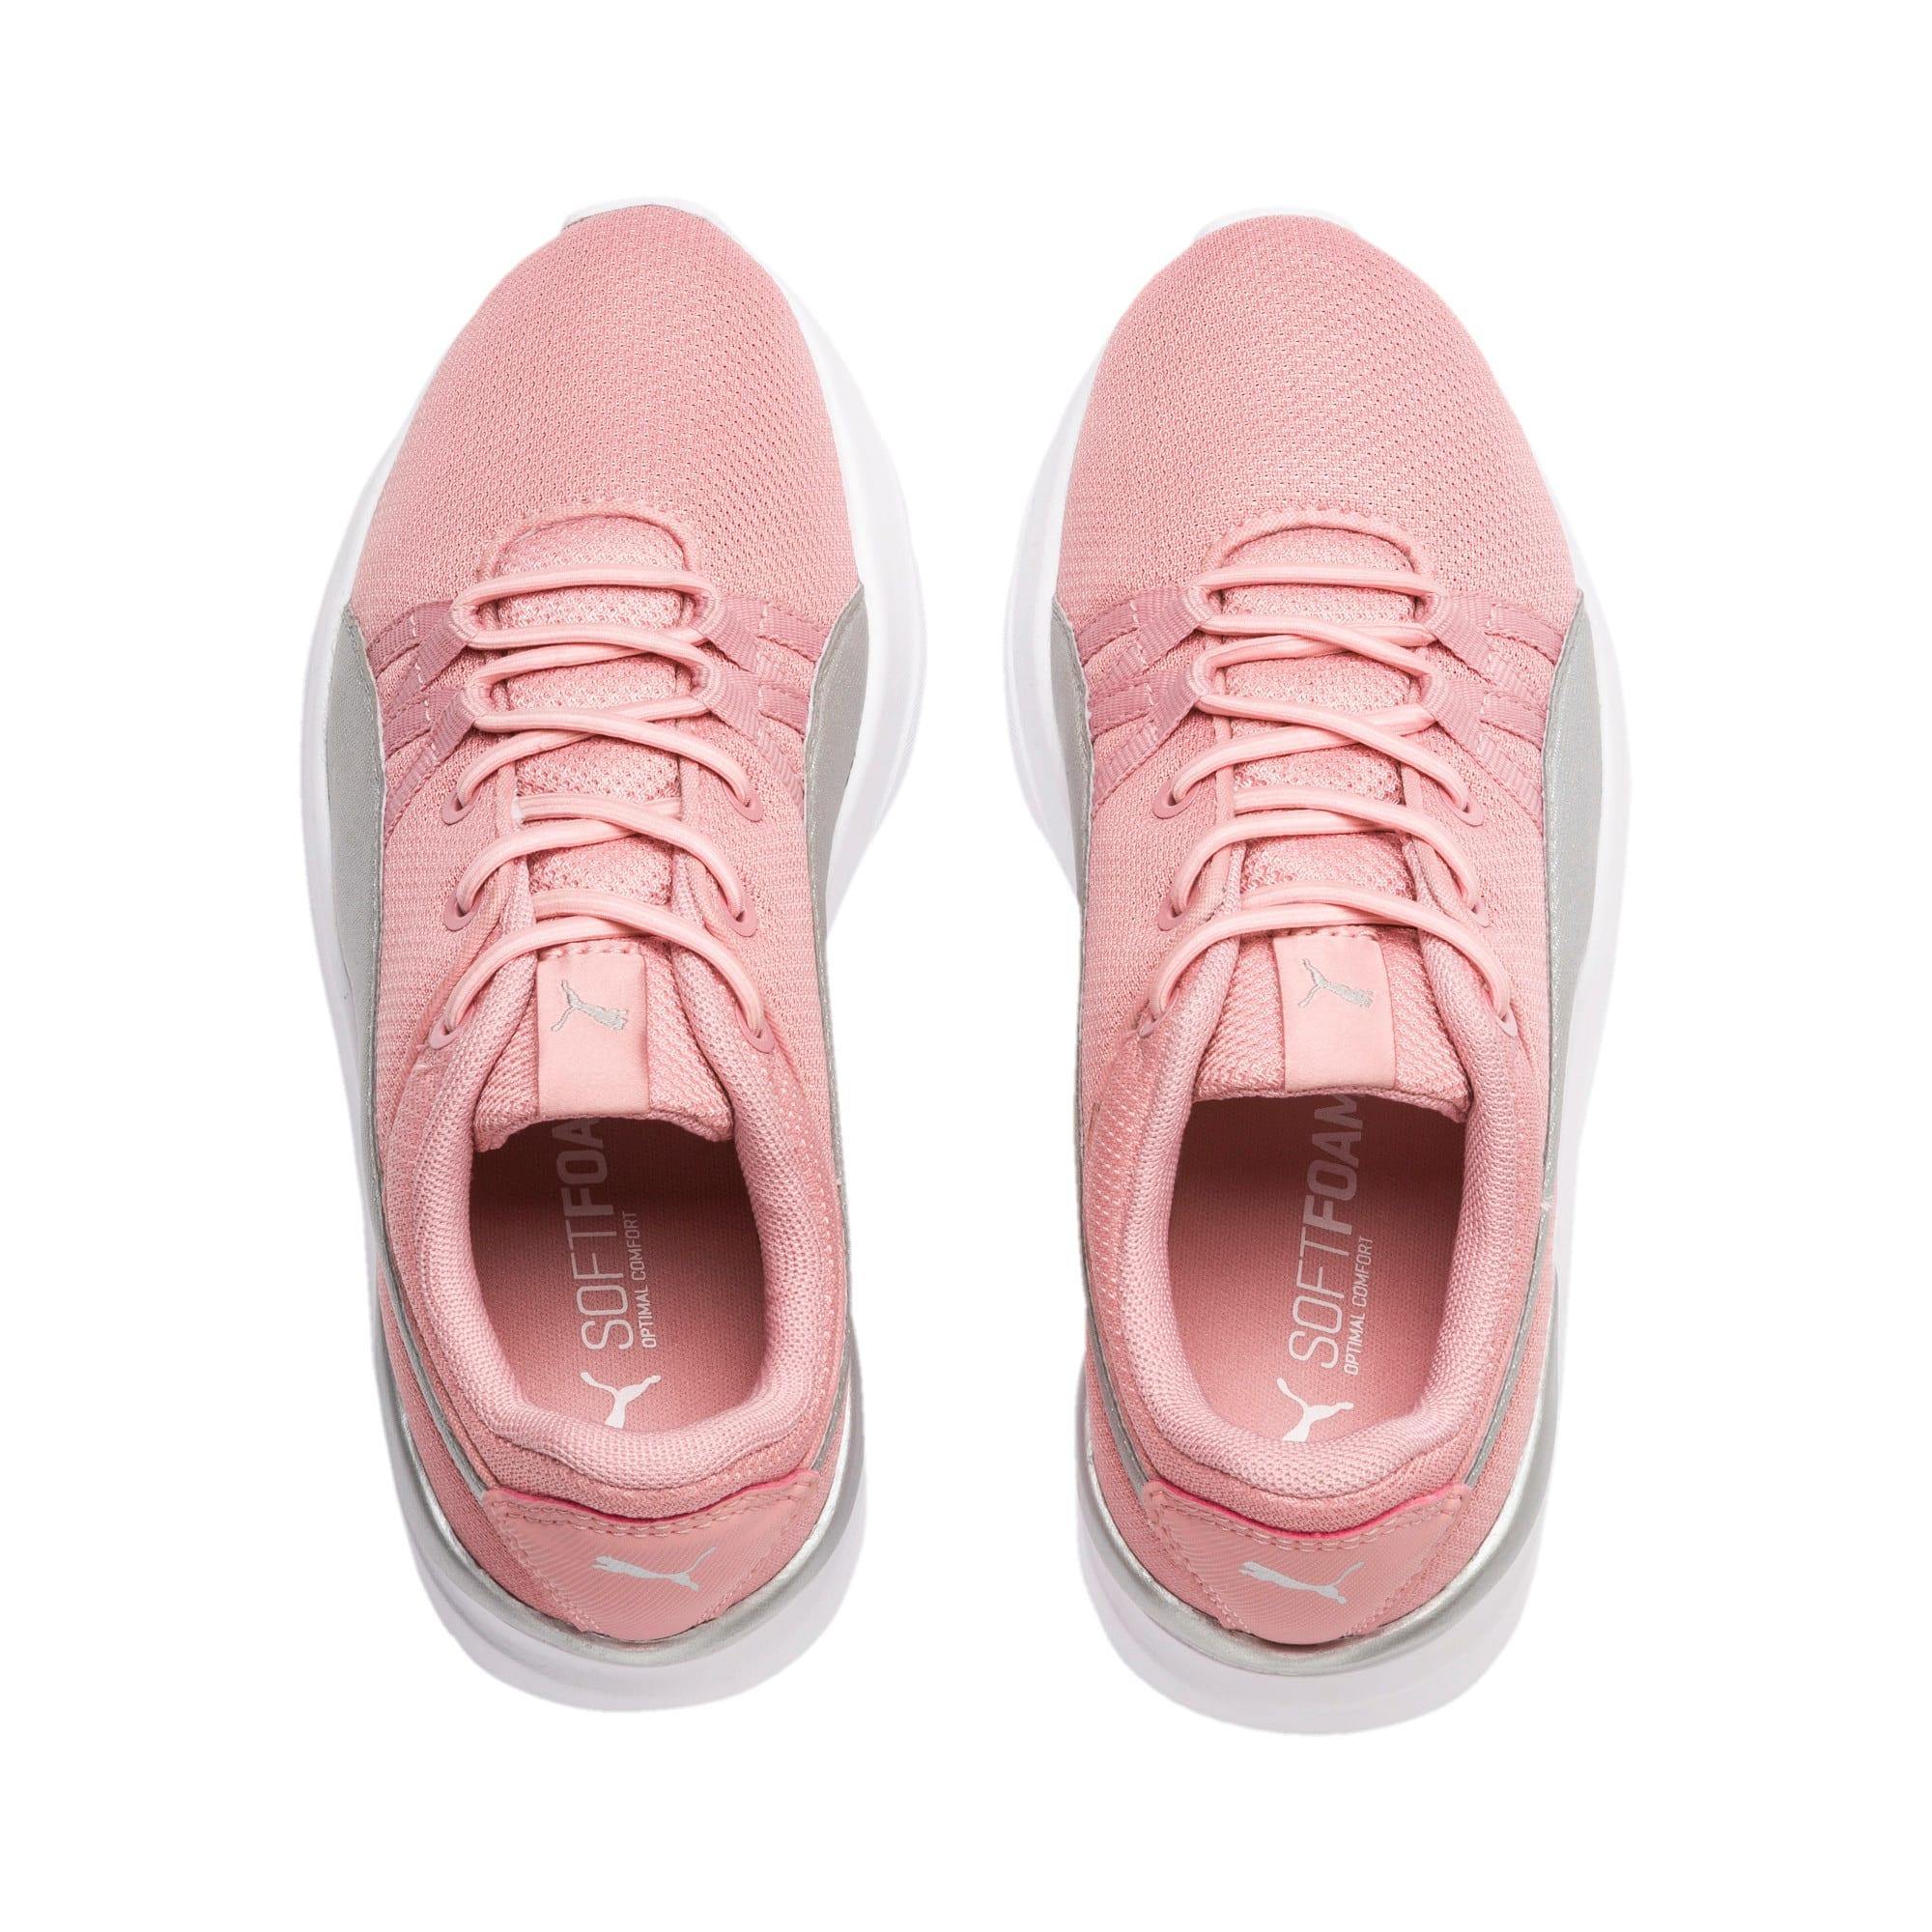 Thumbnail 6 of Adela Breathe AC Sneakers PS, Bridal Rose-Puma Silver, medium